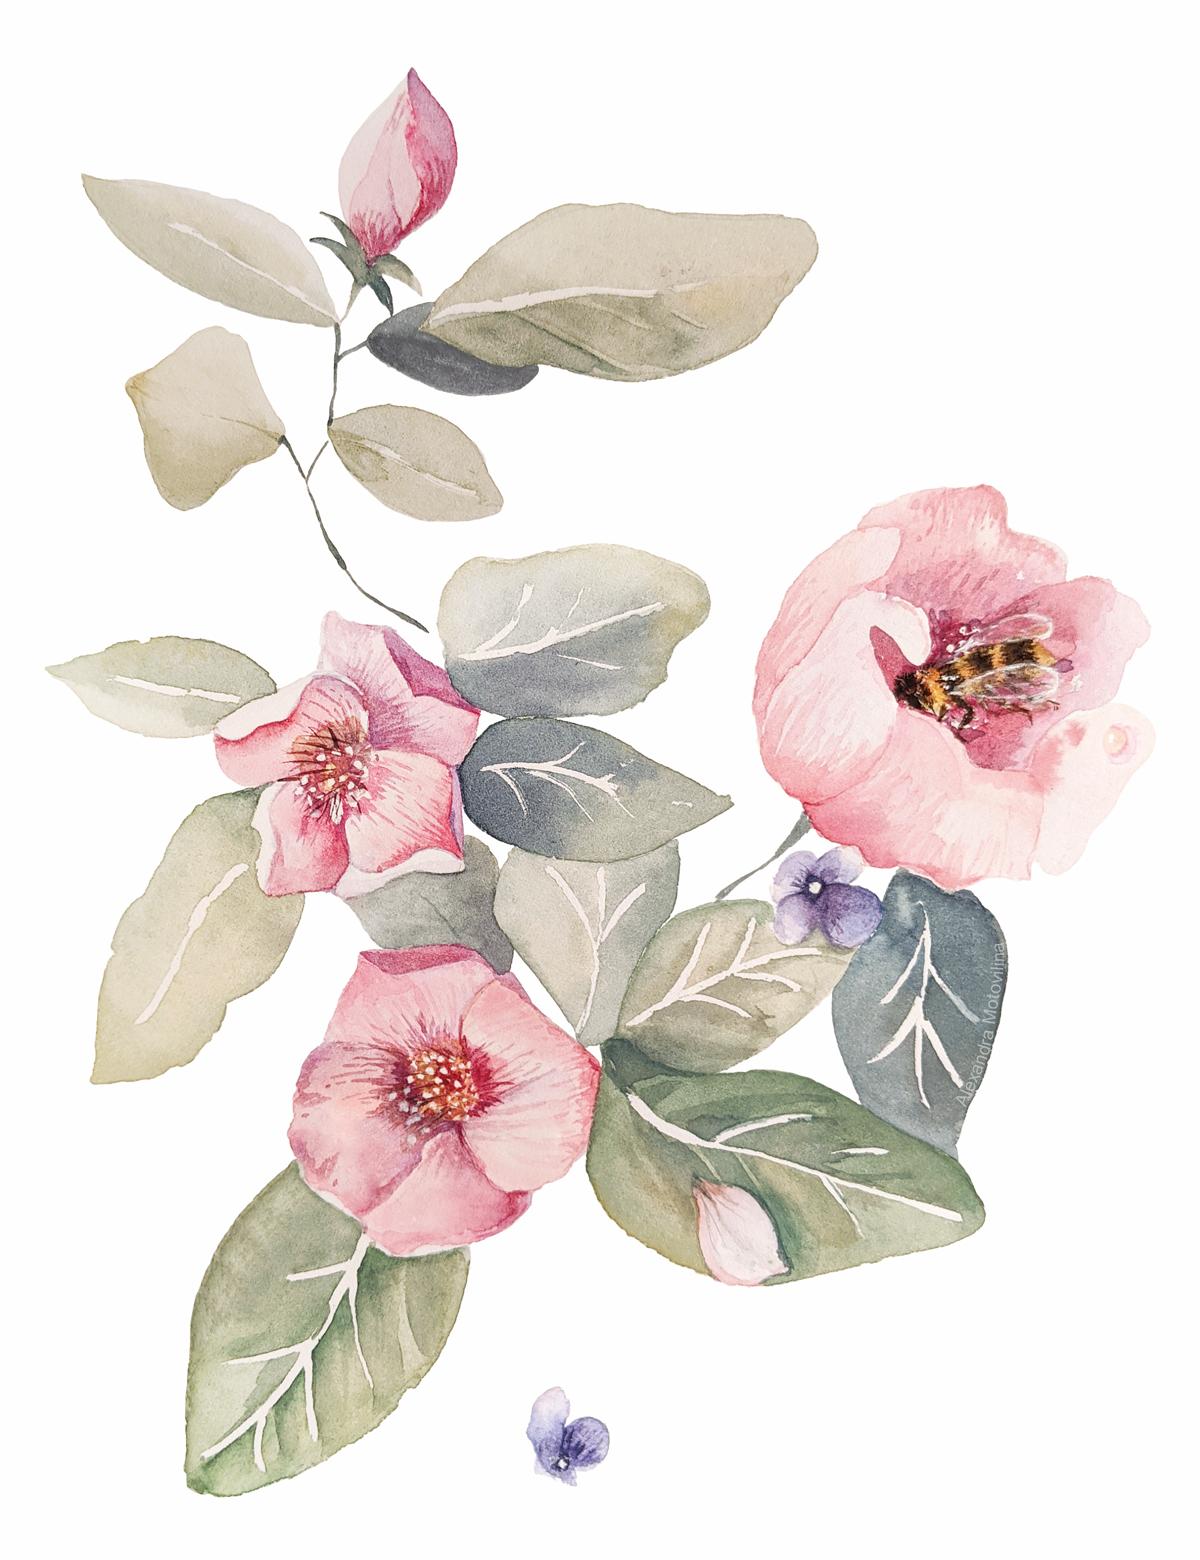 Alexandra-Motovilina_Appl-Blossom